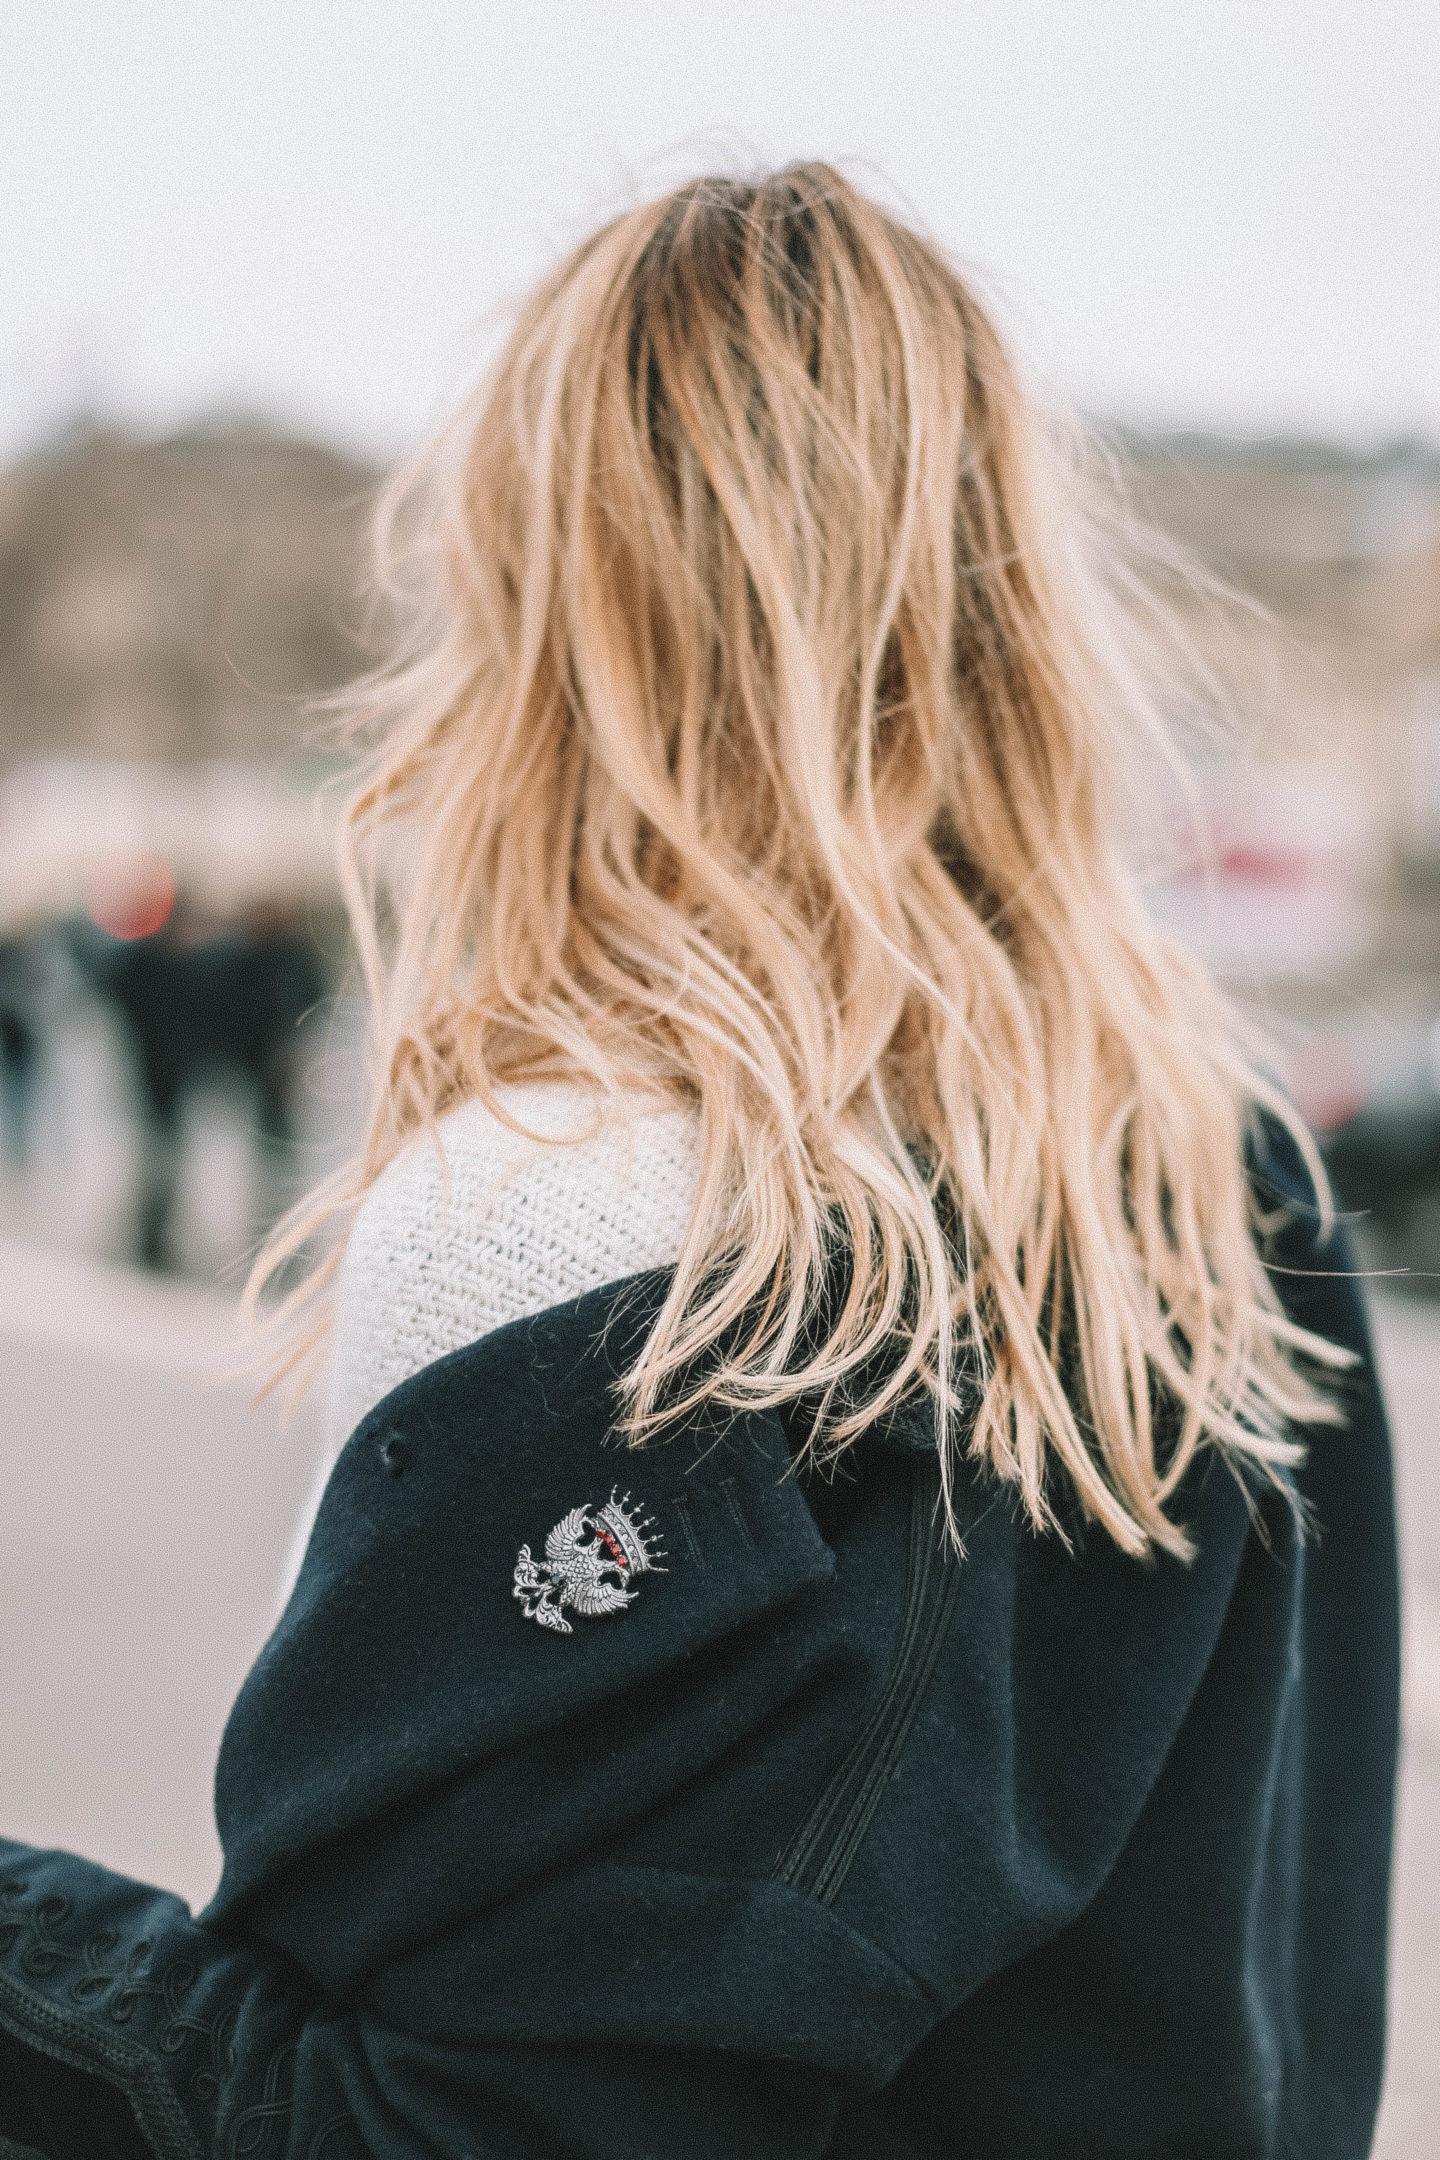 Coiffures - Blondie Baby blog mode et voyages